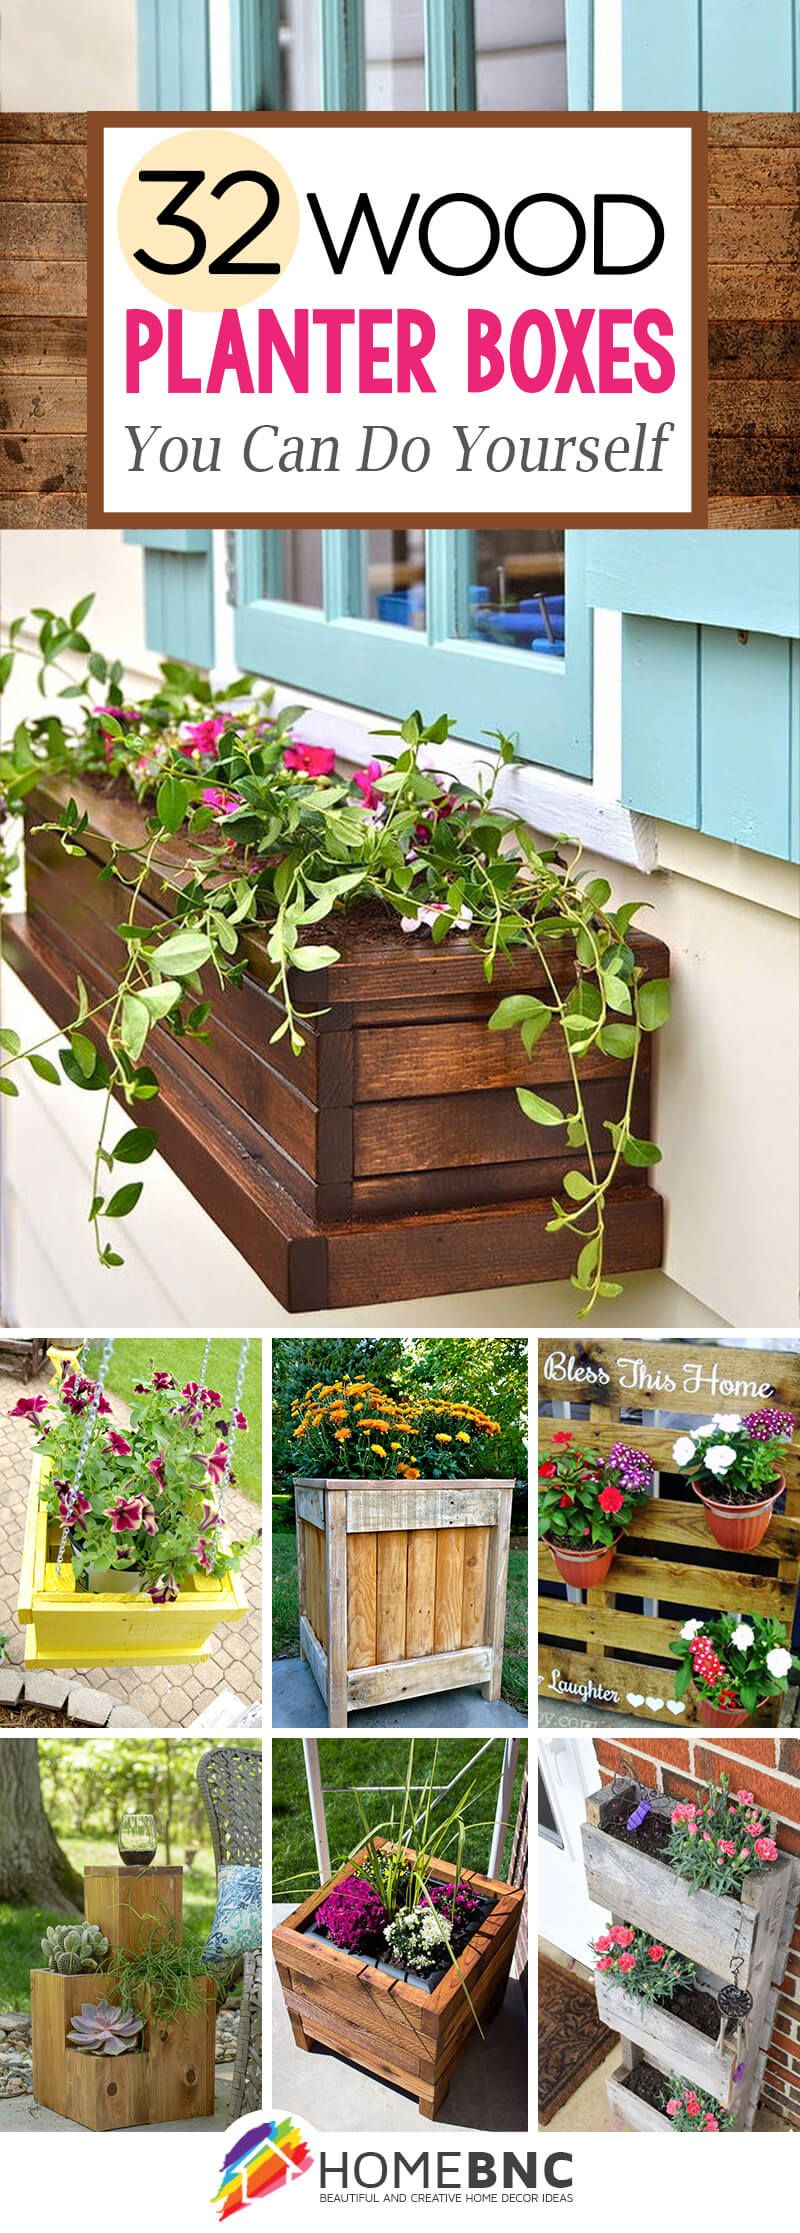 diy pallet and wood planter box decorations [ 800 x 2233 Pixel ]